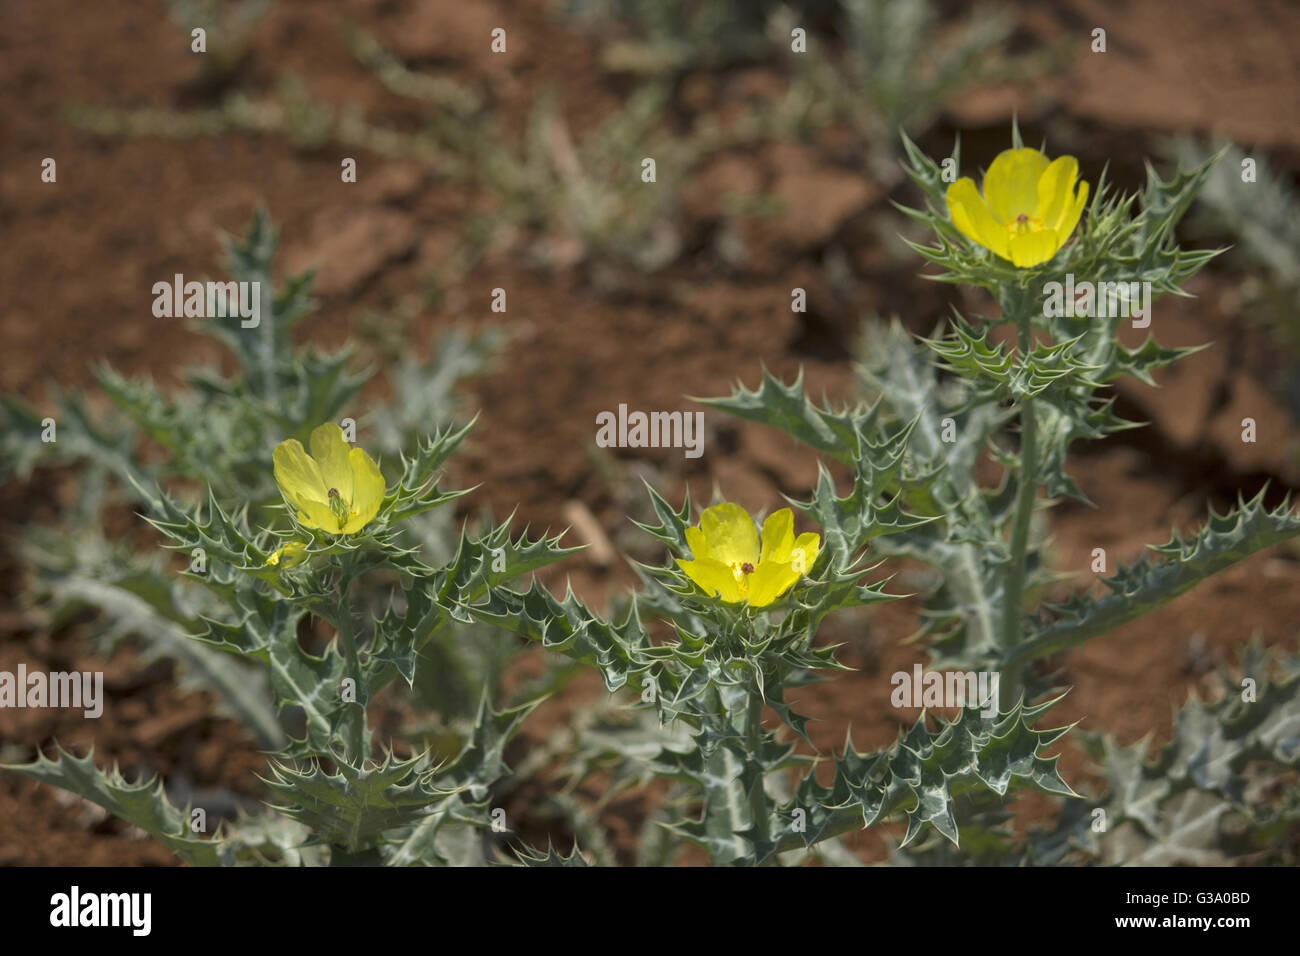 Argemone Mexicana Mexican Prickle Poppy Yellow Flower, Madhya Pradesh, India - Stock Image